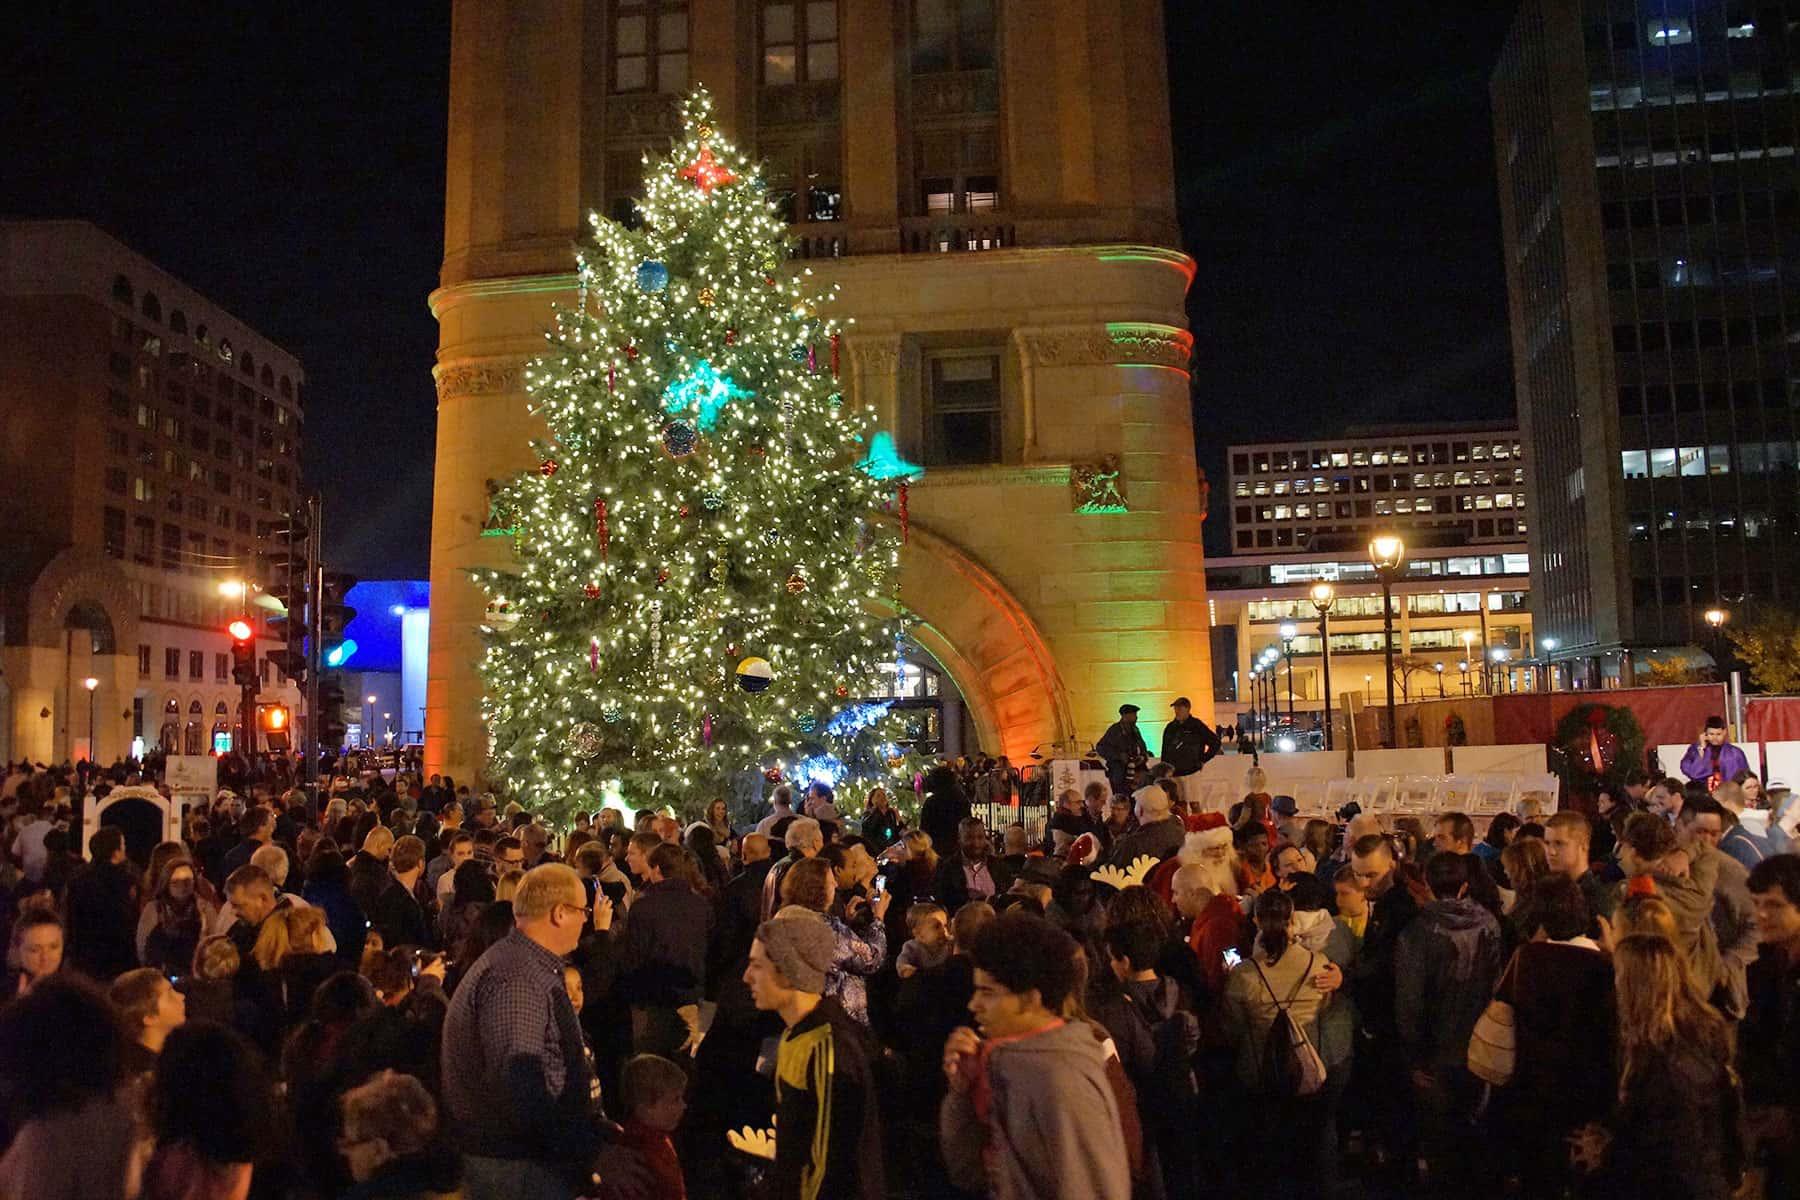 Tree lighting kicks-off the 2016 holiday season | The Milwaukee ...